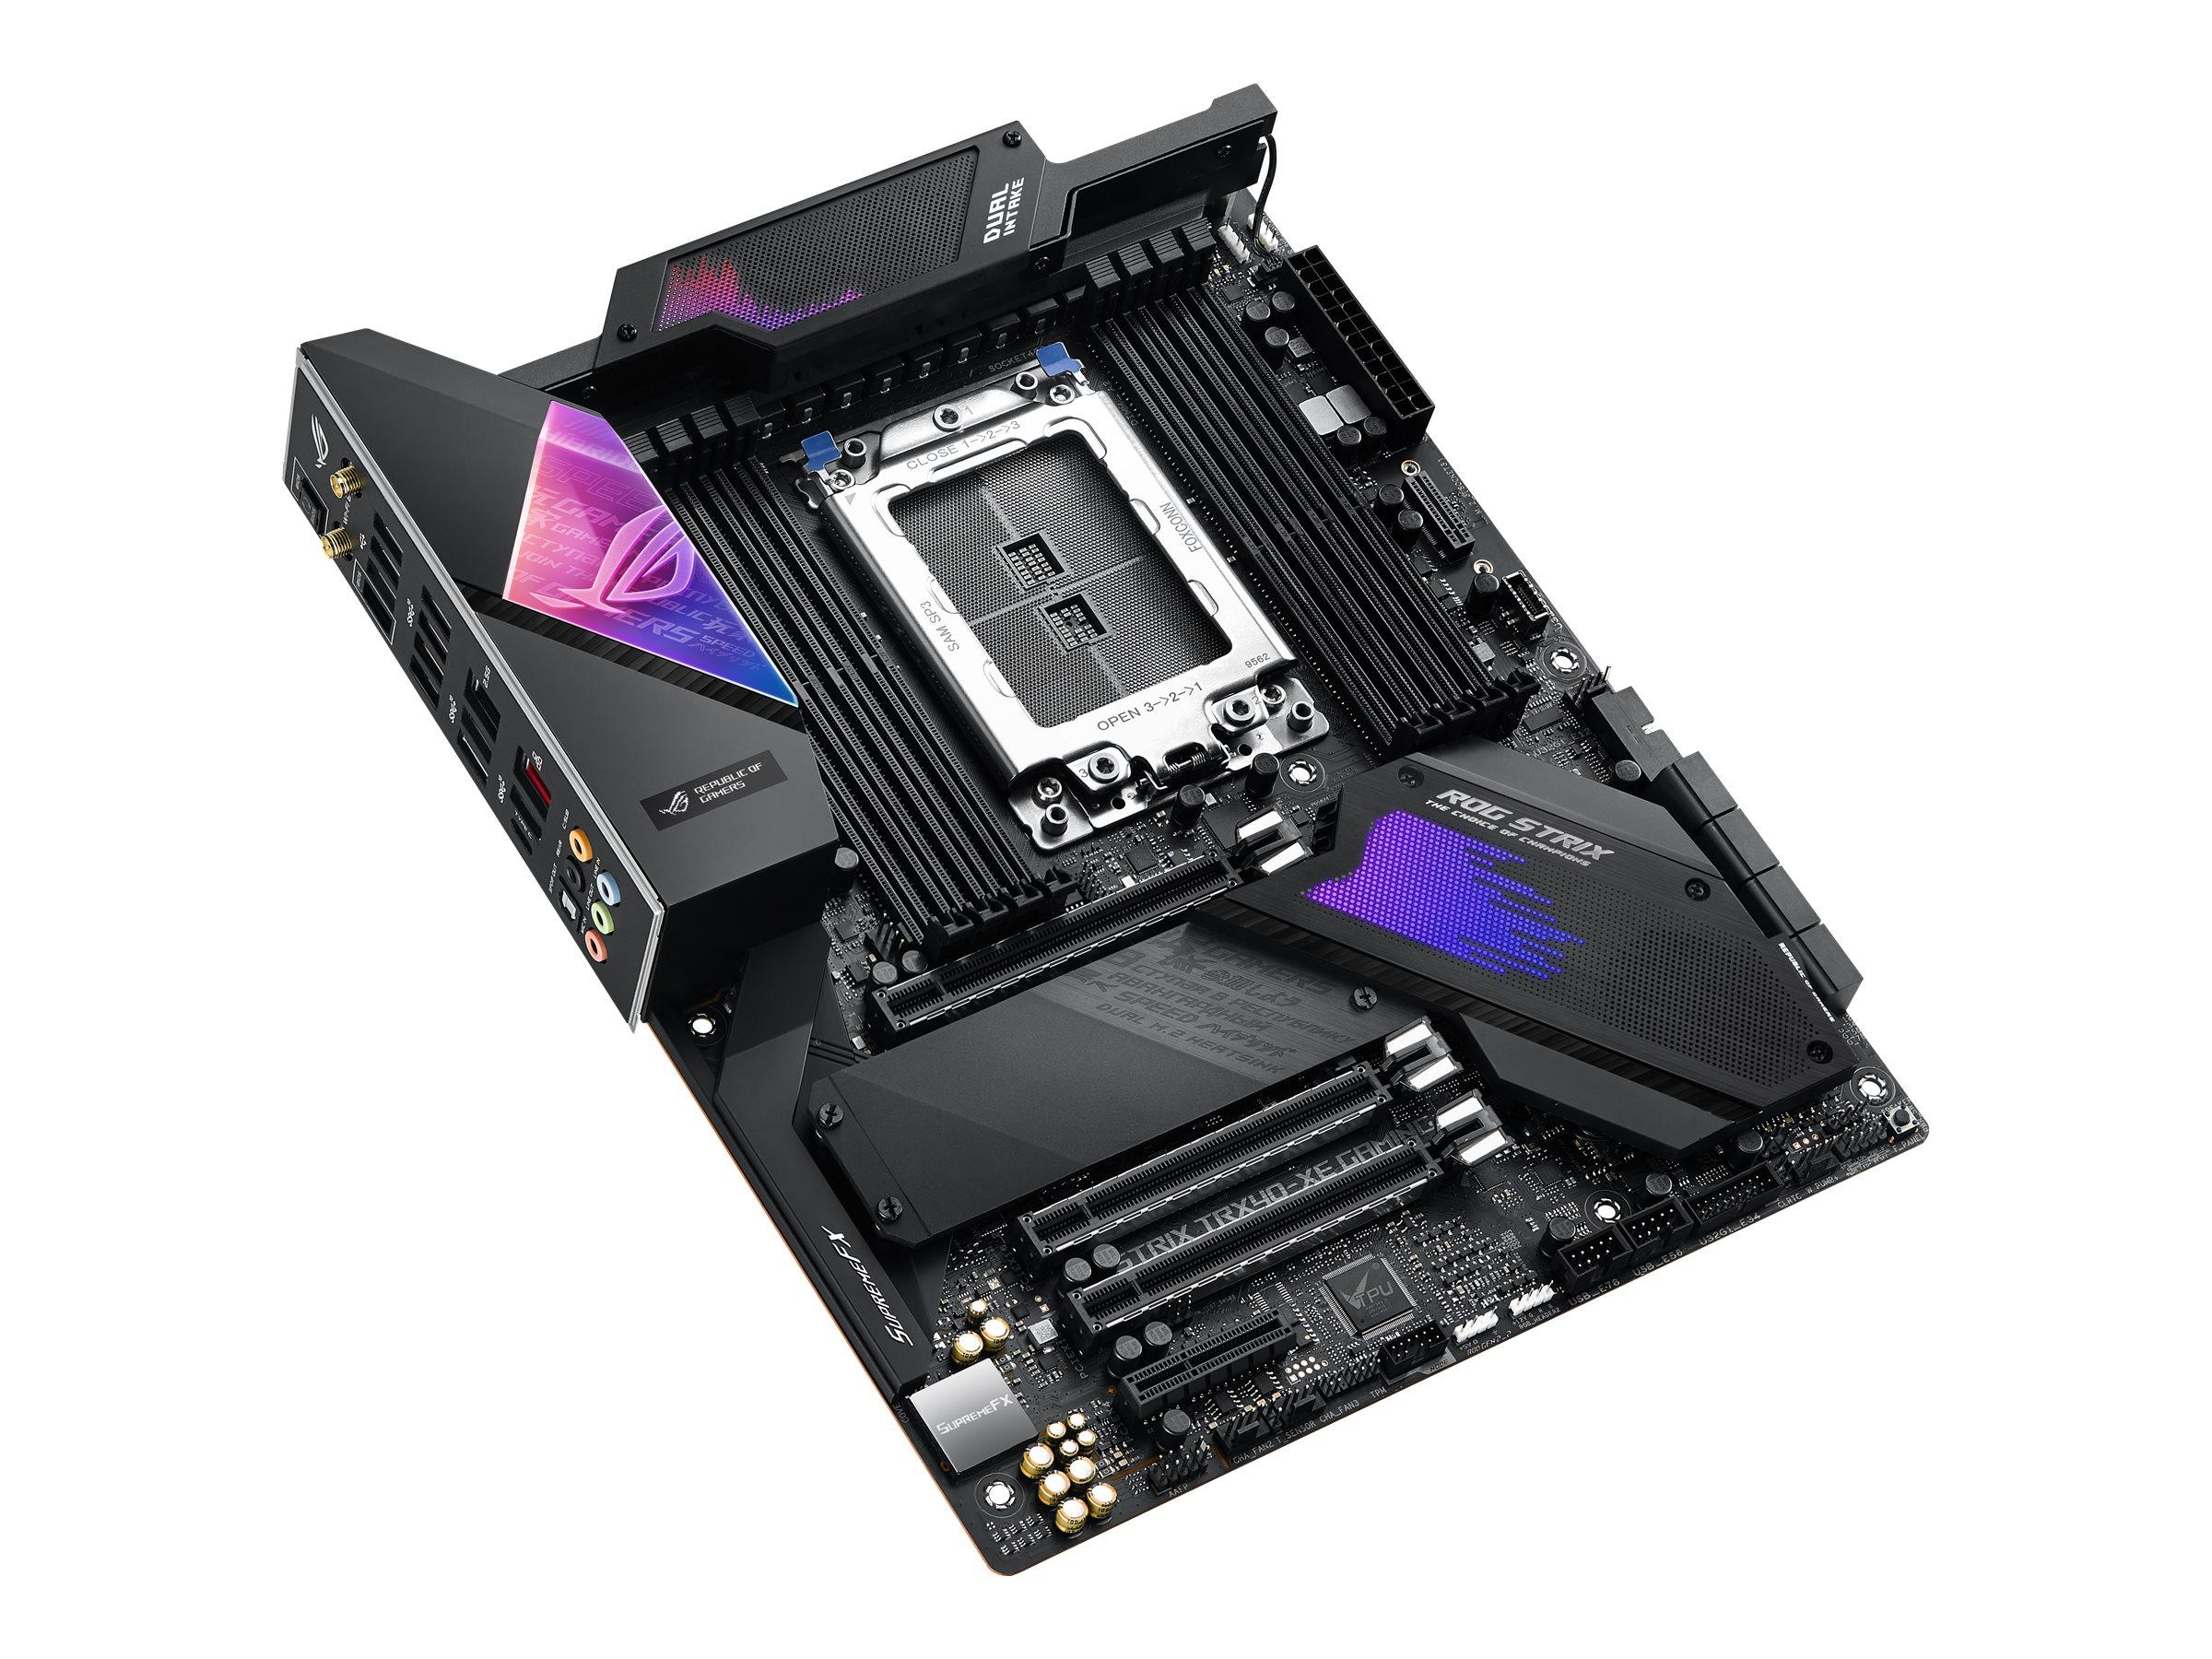 ASUS ROG STRIX TRX40-XE GAMING - Motherboard - ATX - Socket sTRX4 - AMD TRX40 - USB-C Gen2, USB 3.2 Gen 1, USB 3.2 Gen 2 - Gigabit LAN, 2.5 Gigabit LAN, Wi-Fi, Bluetooth - HD Audio (8-Kanal)